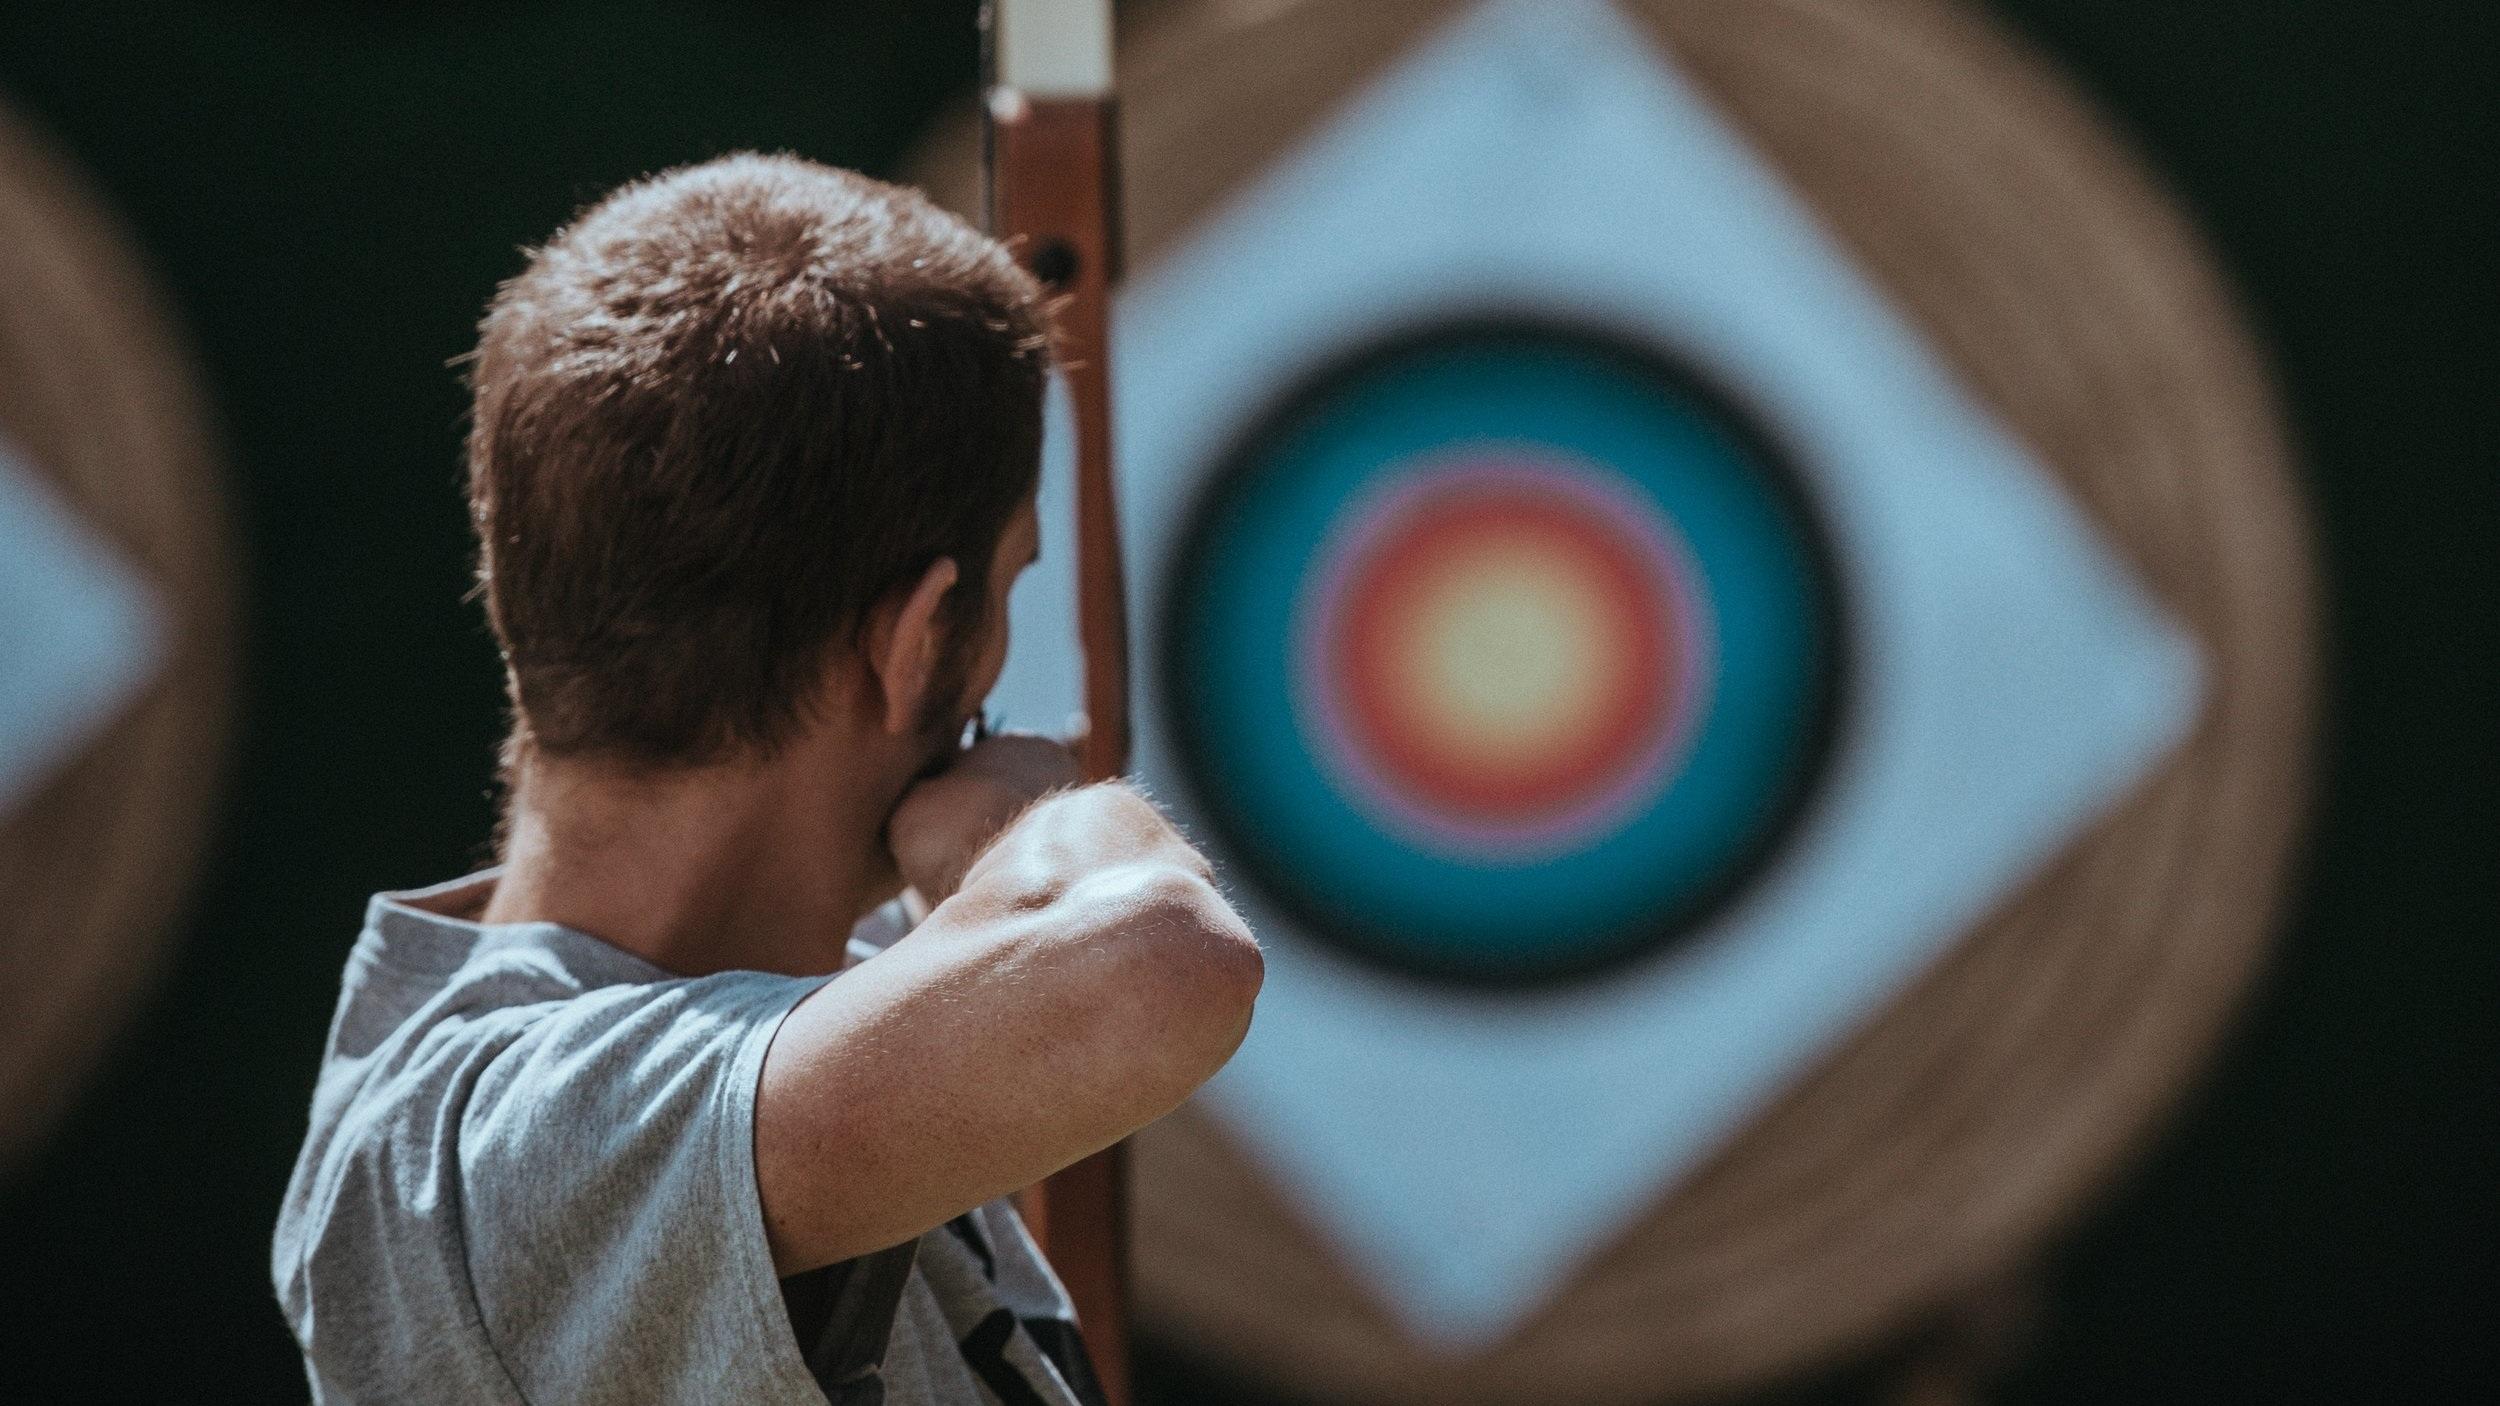 arrow-target-annie-spratt-450566-unsplash.jpg